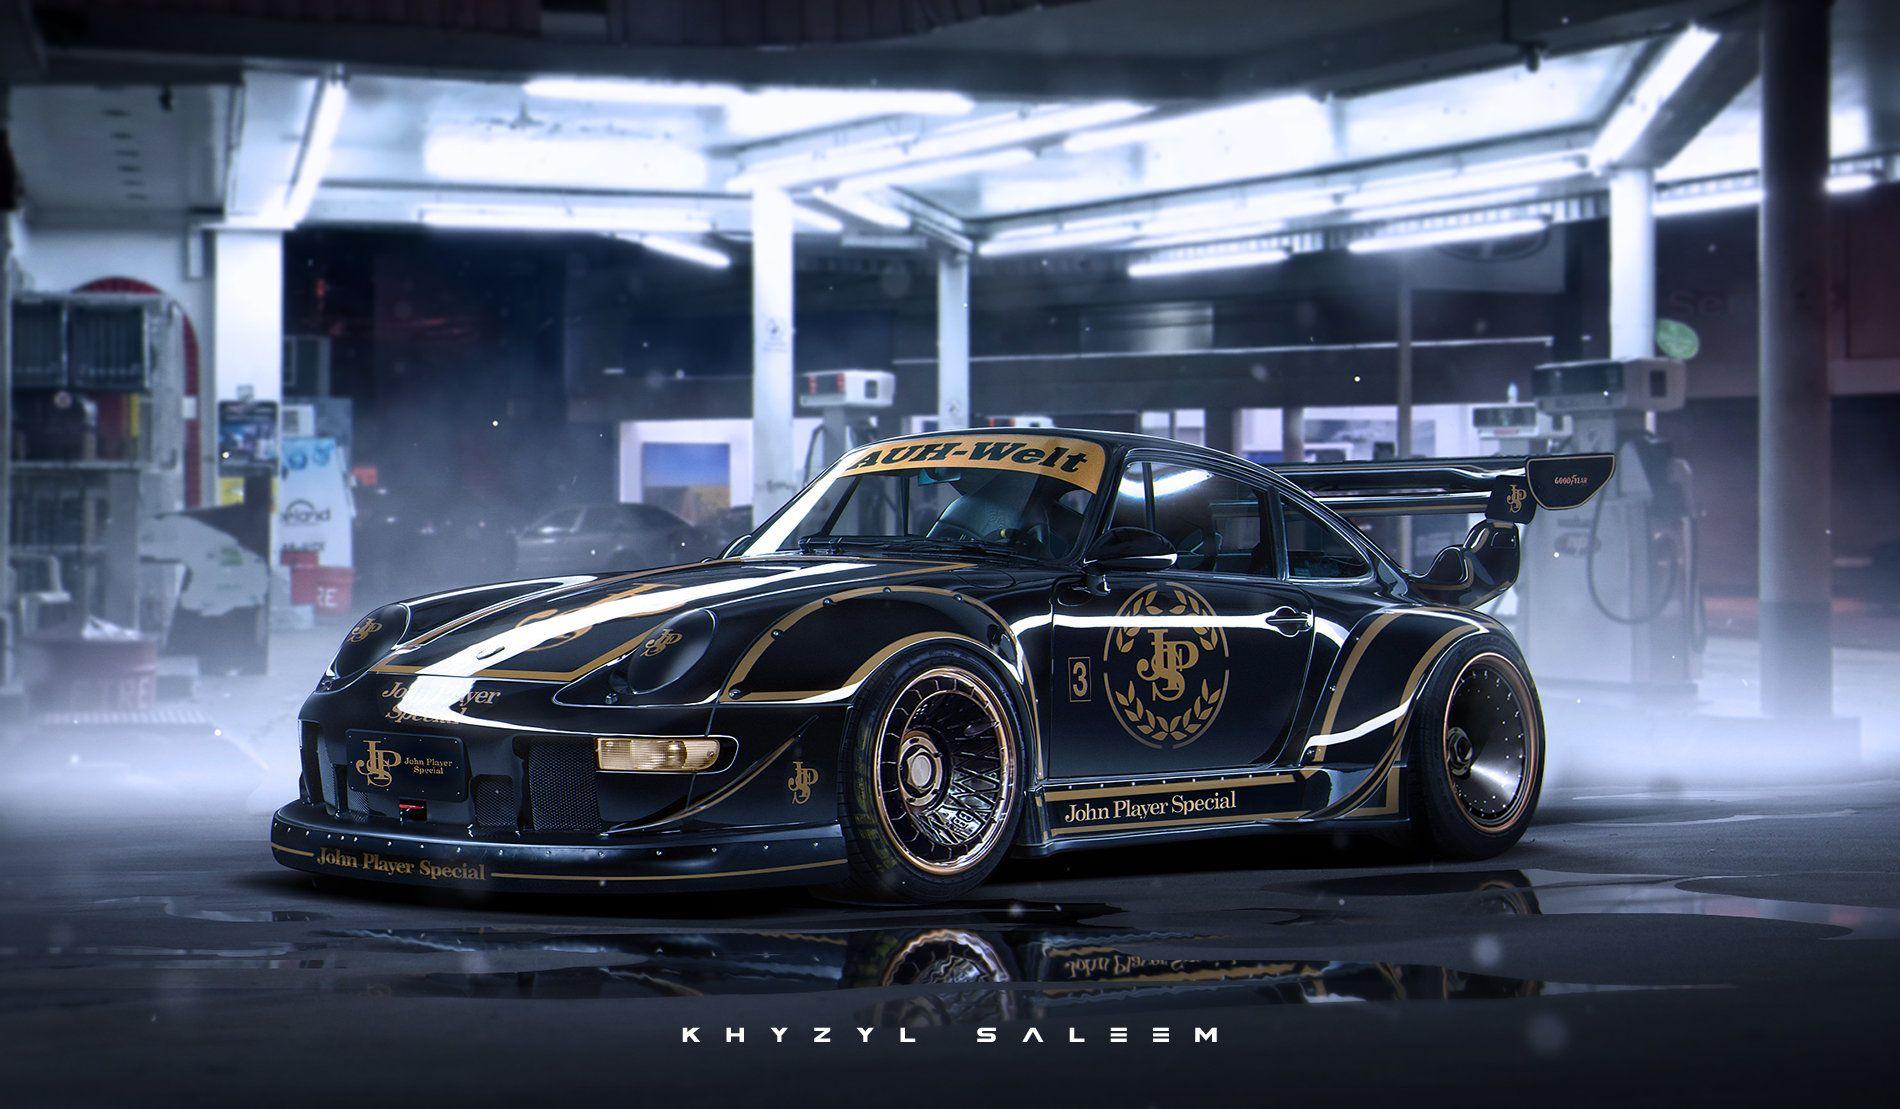 Artstation Rwb John Player Special Khyzyl Saleem Porsche Car Car Artwork